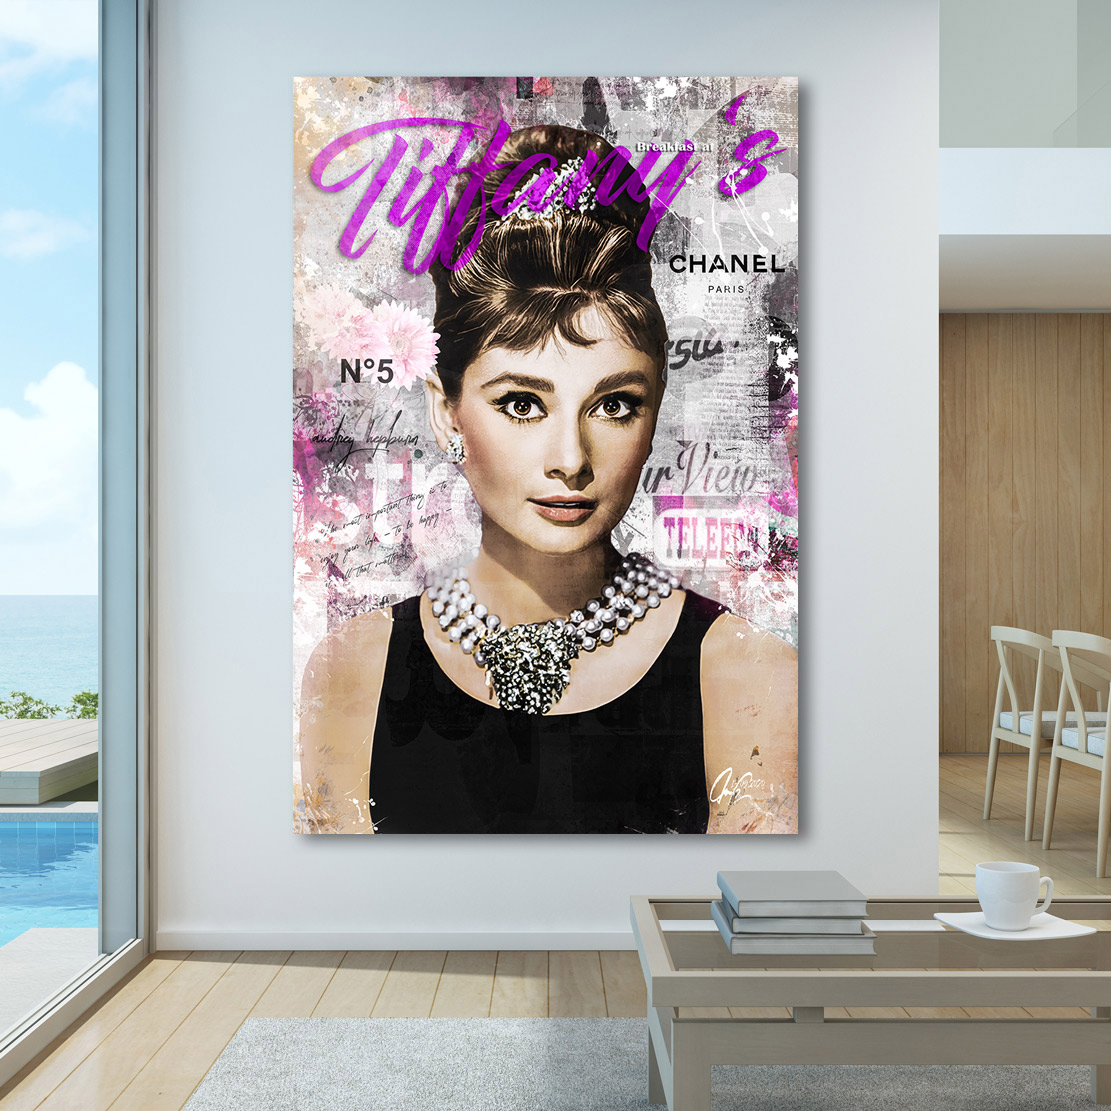 Motiv Audrey Hepburn Plakativ  Pop Art//Malerei//StreetArt//Leinwand//Kunstdruck